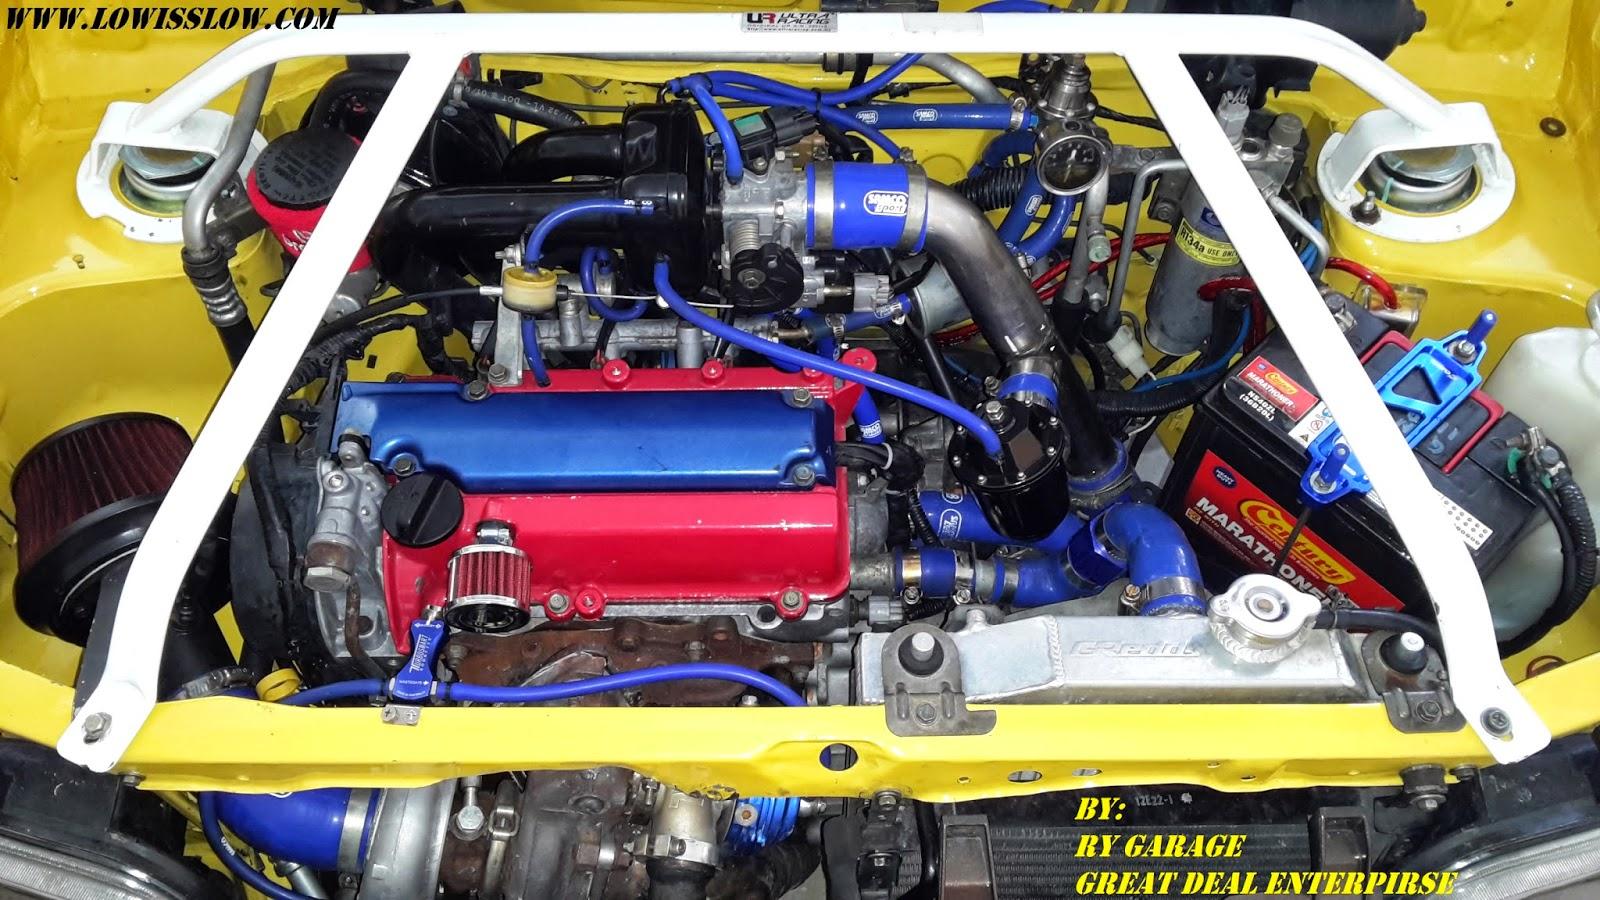 Daihatsu L9 Wiring Diagram  Ef Det L9 Turbo Ecu Wiring Diagram  Diy Wiring Meter Daihatsu Mira